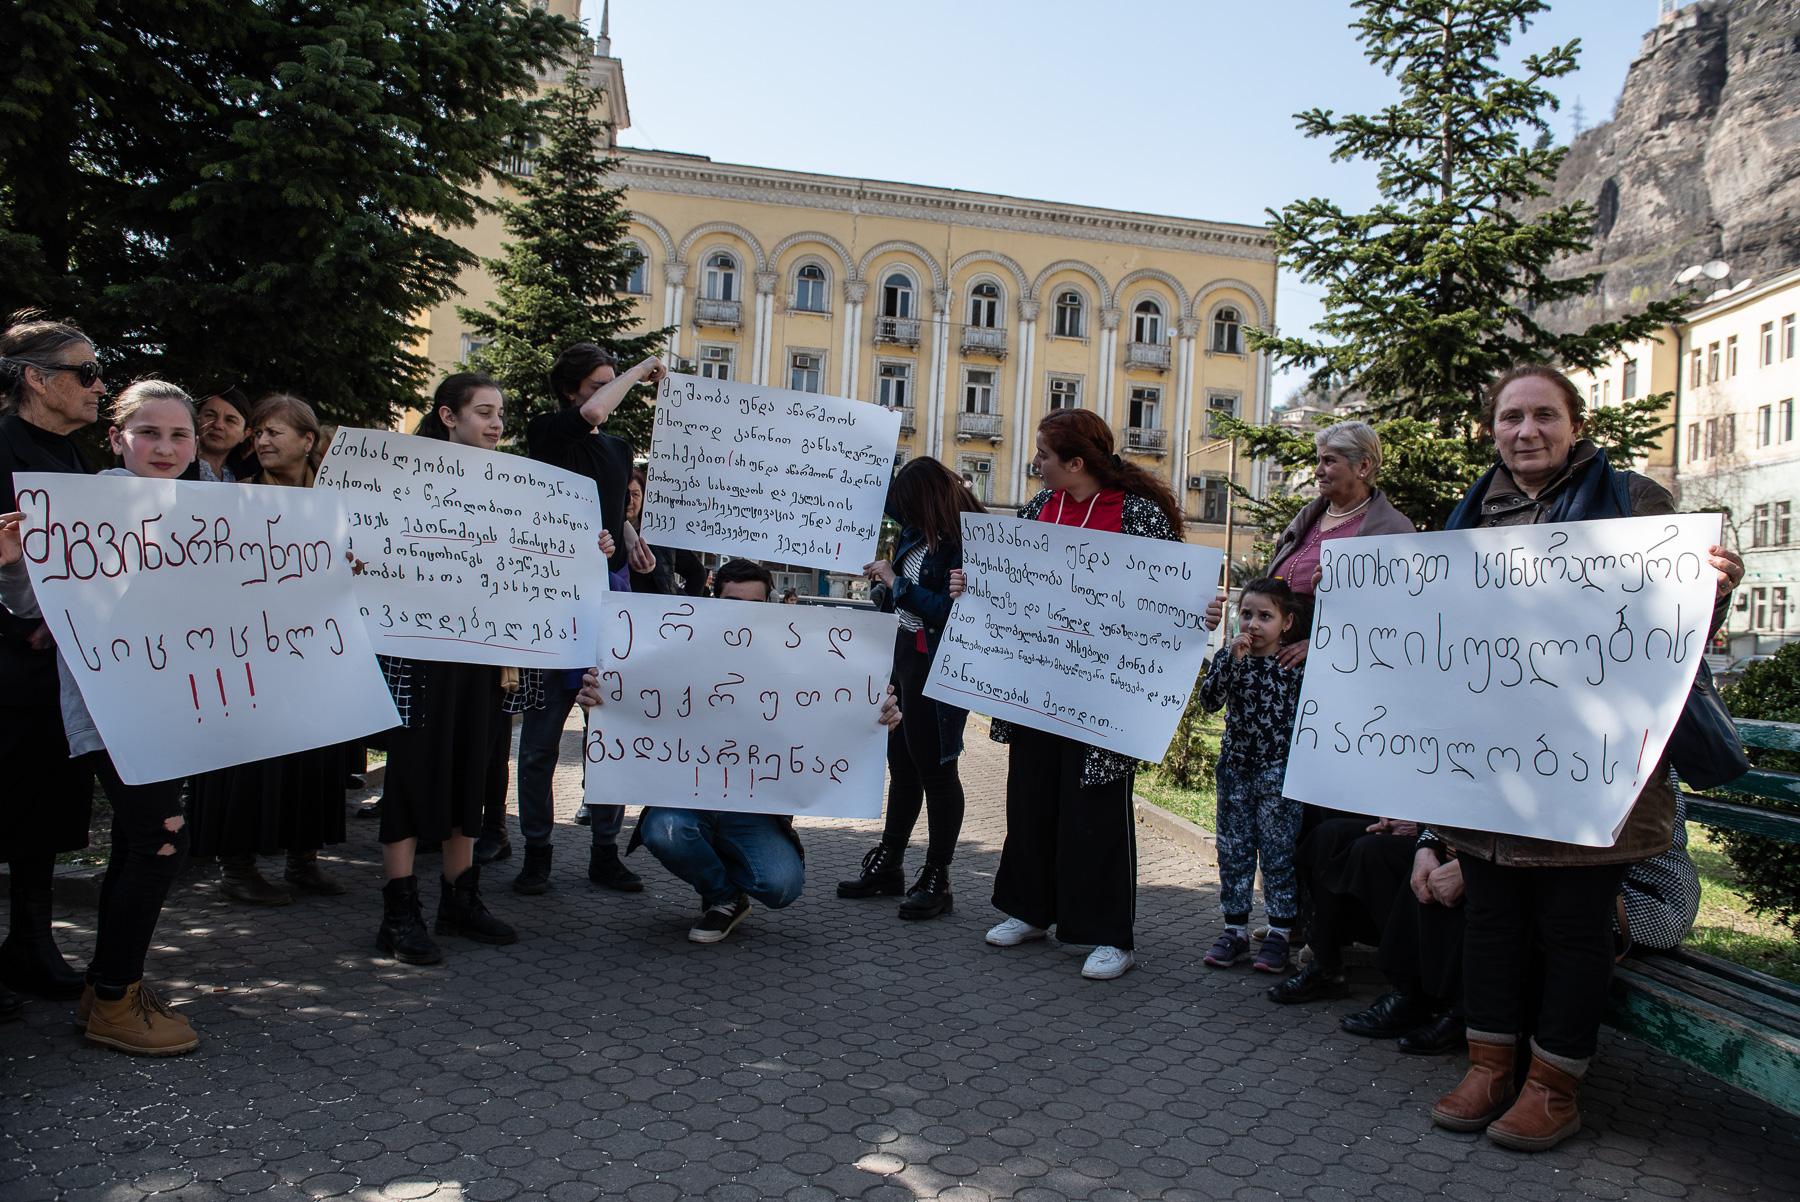 A protest on 8 March 2020. Photo: Mariam Nikuradze/OC Media.